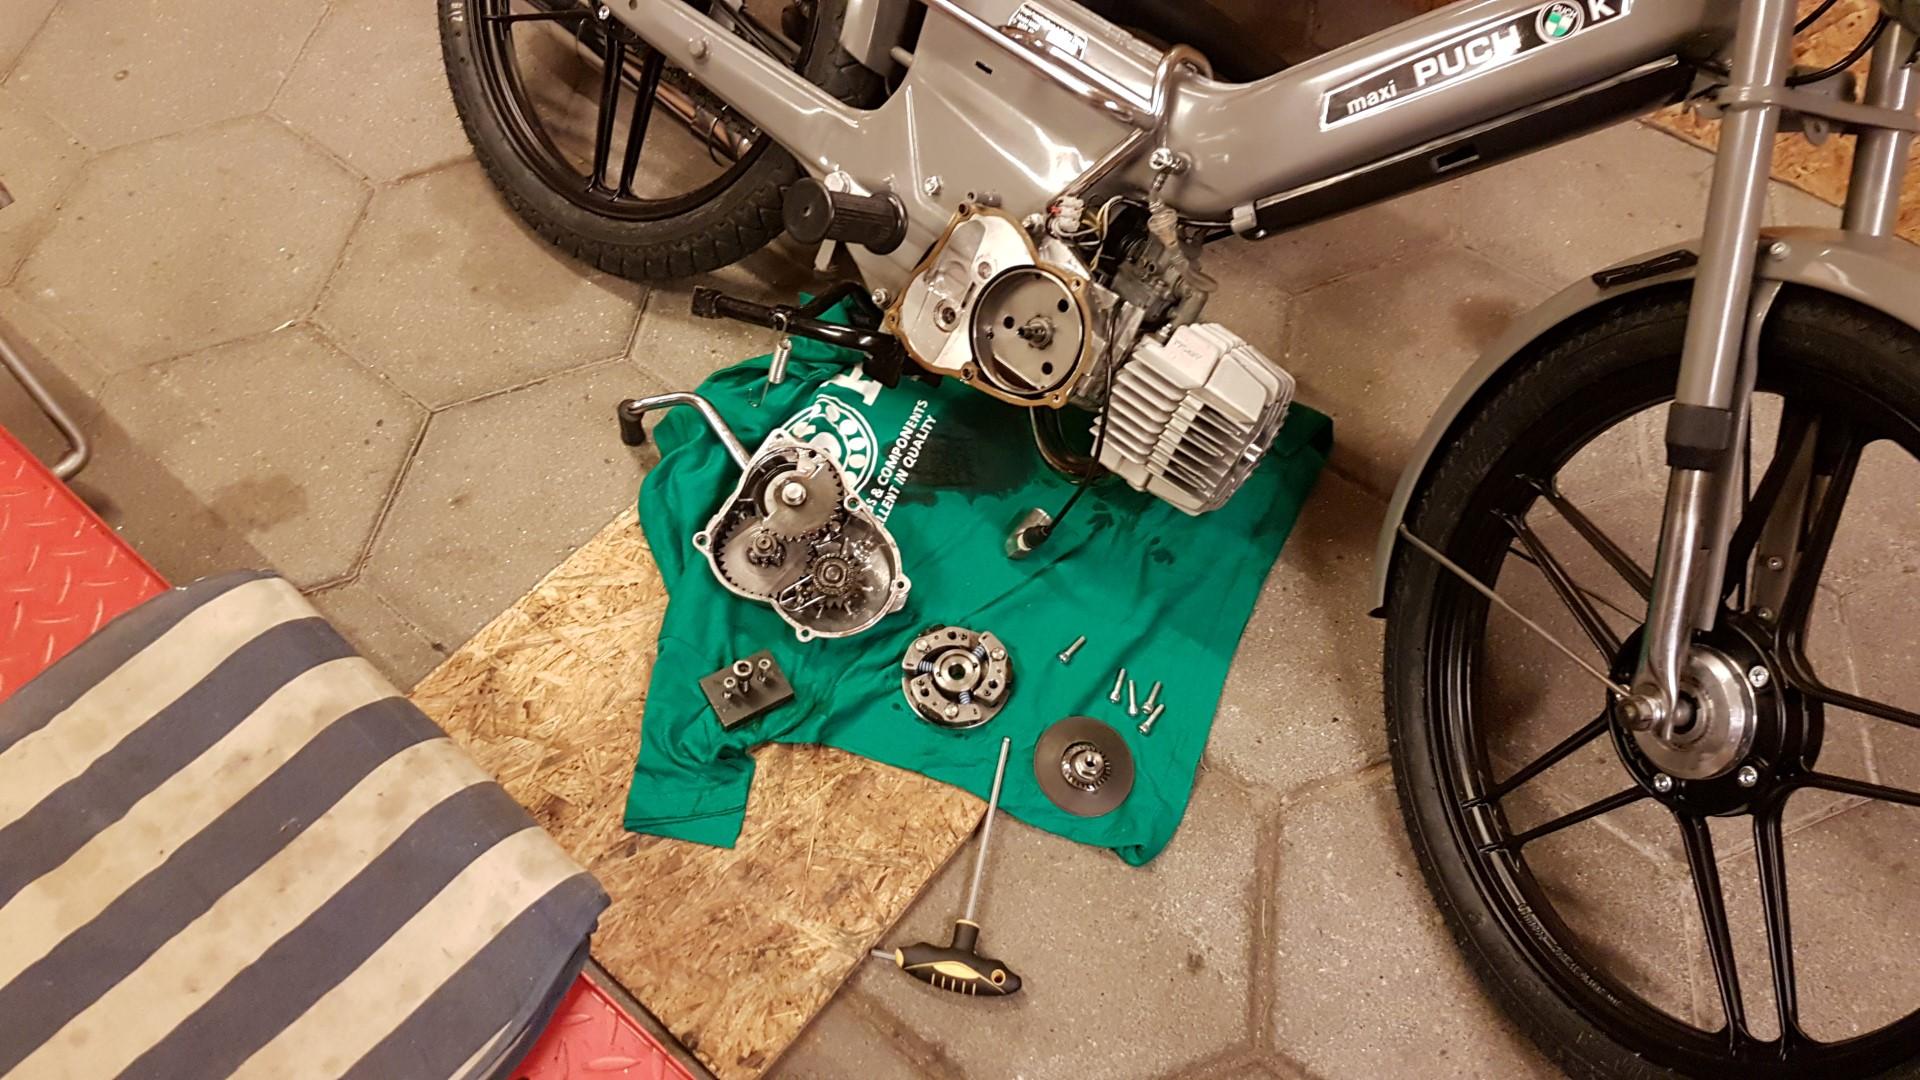 Puch Maxi E50 clutch tuning – 12V dk – Carsten Lorenzen